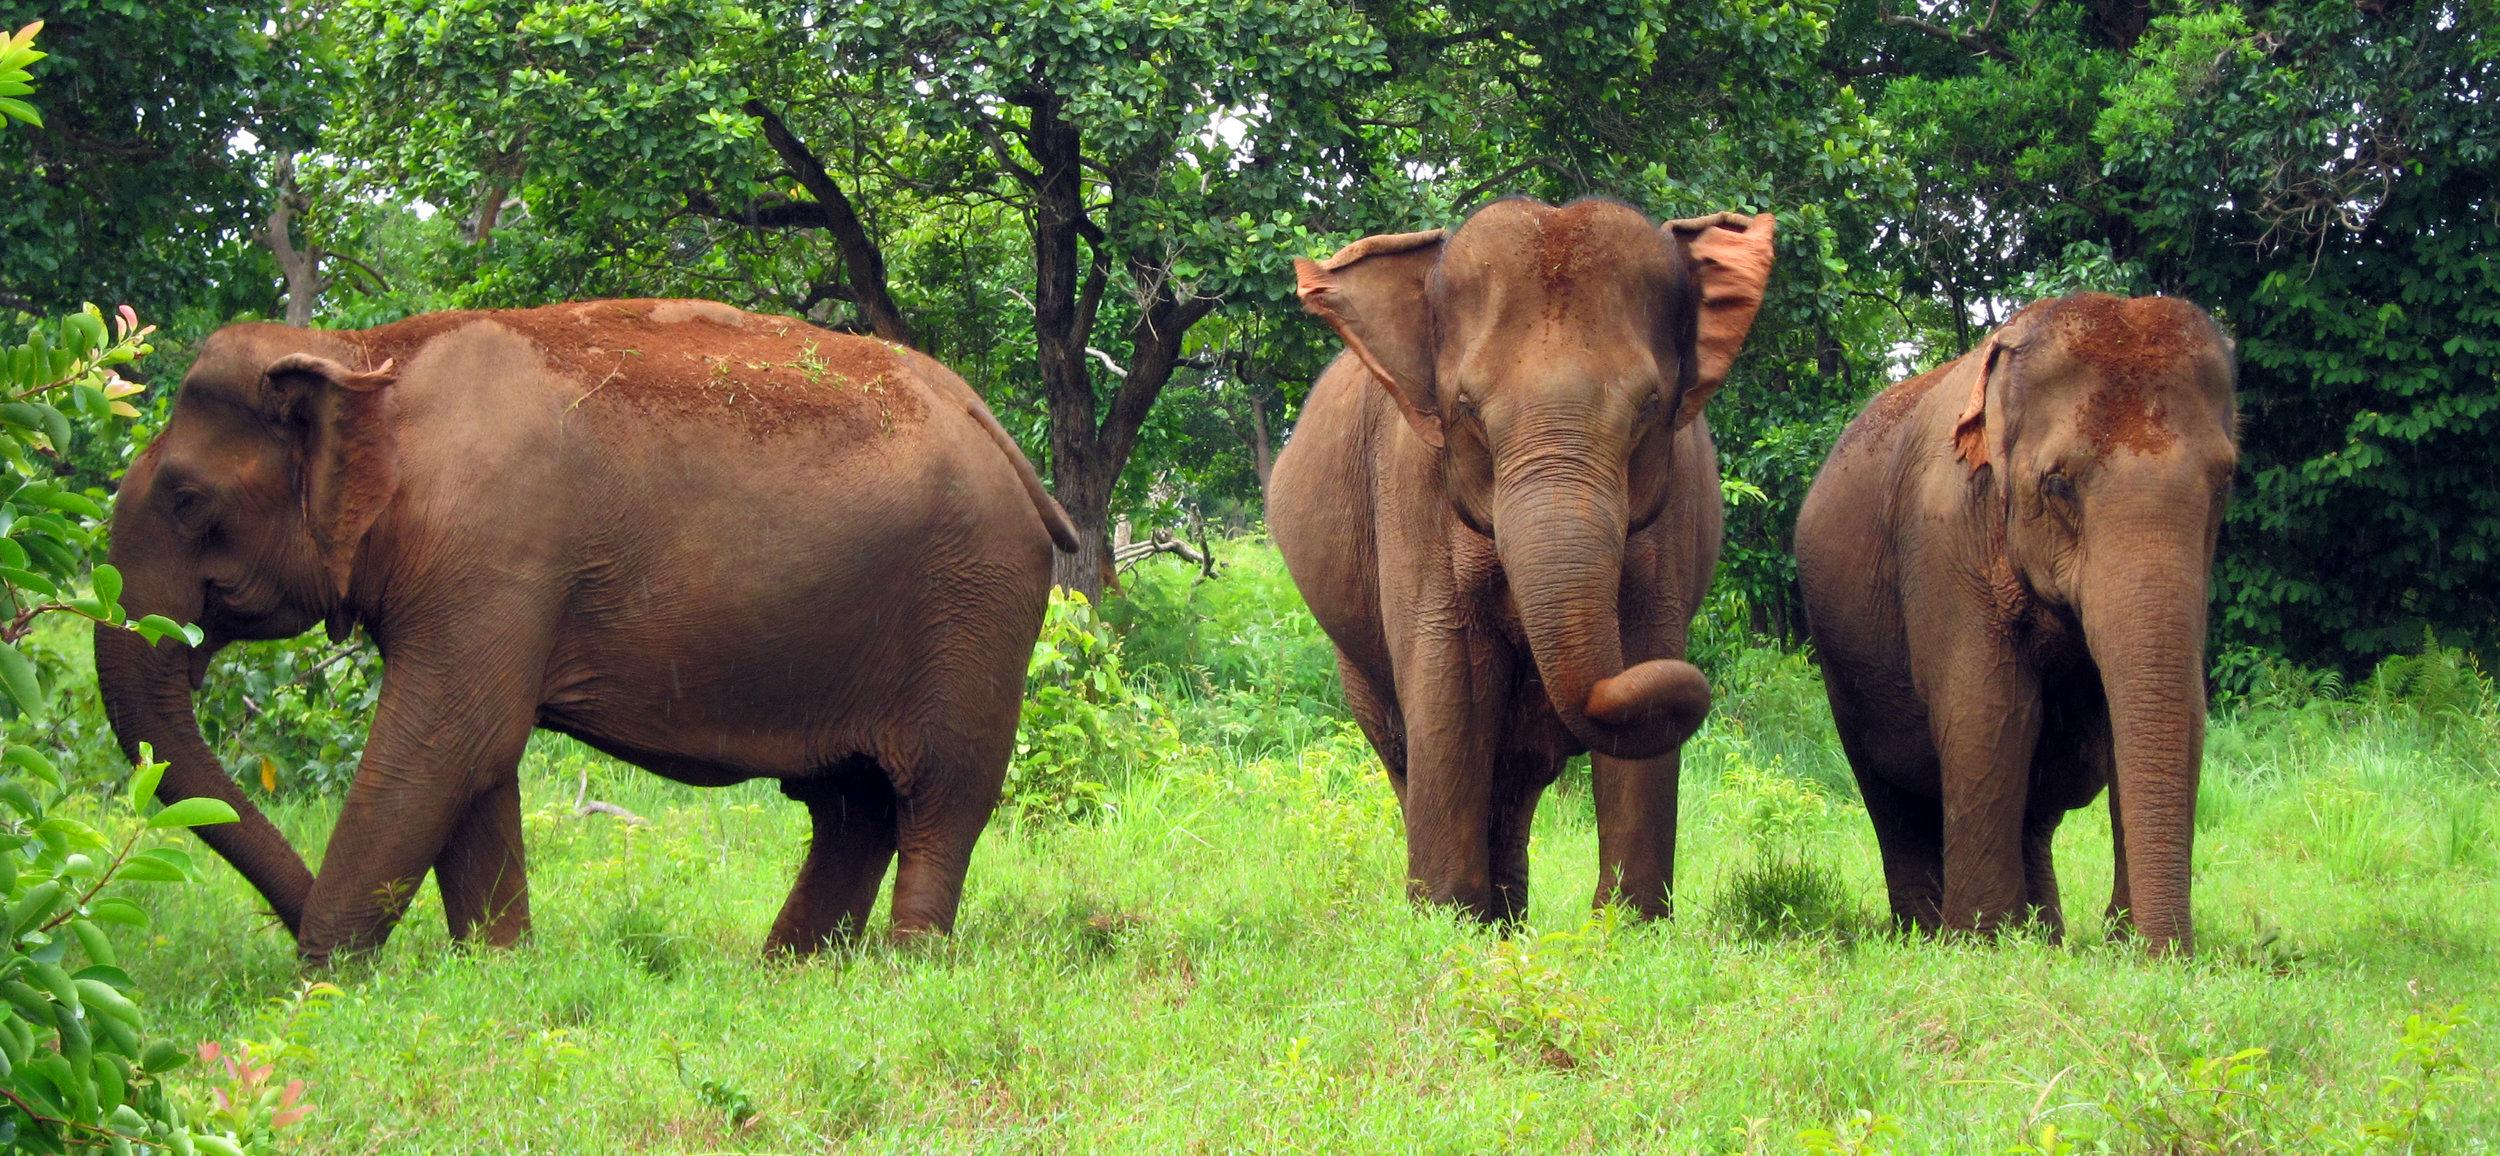 LDHE - elephants 2 - photoIanOliveri.jpg